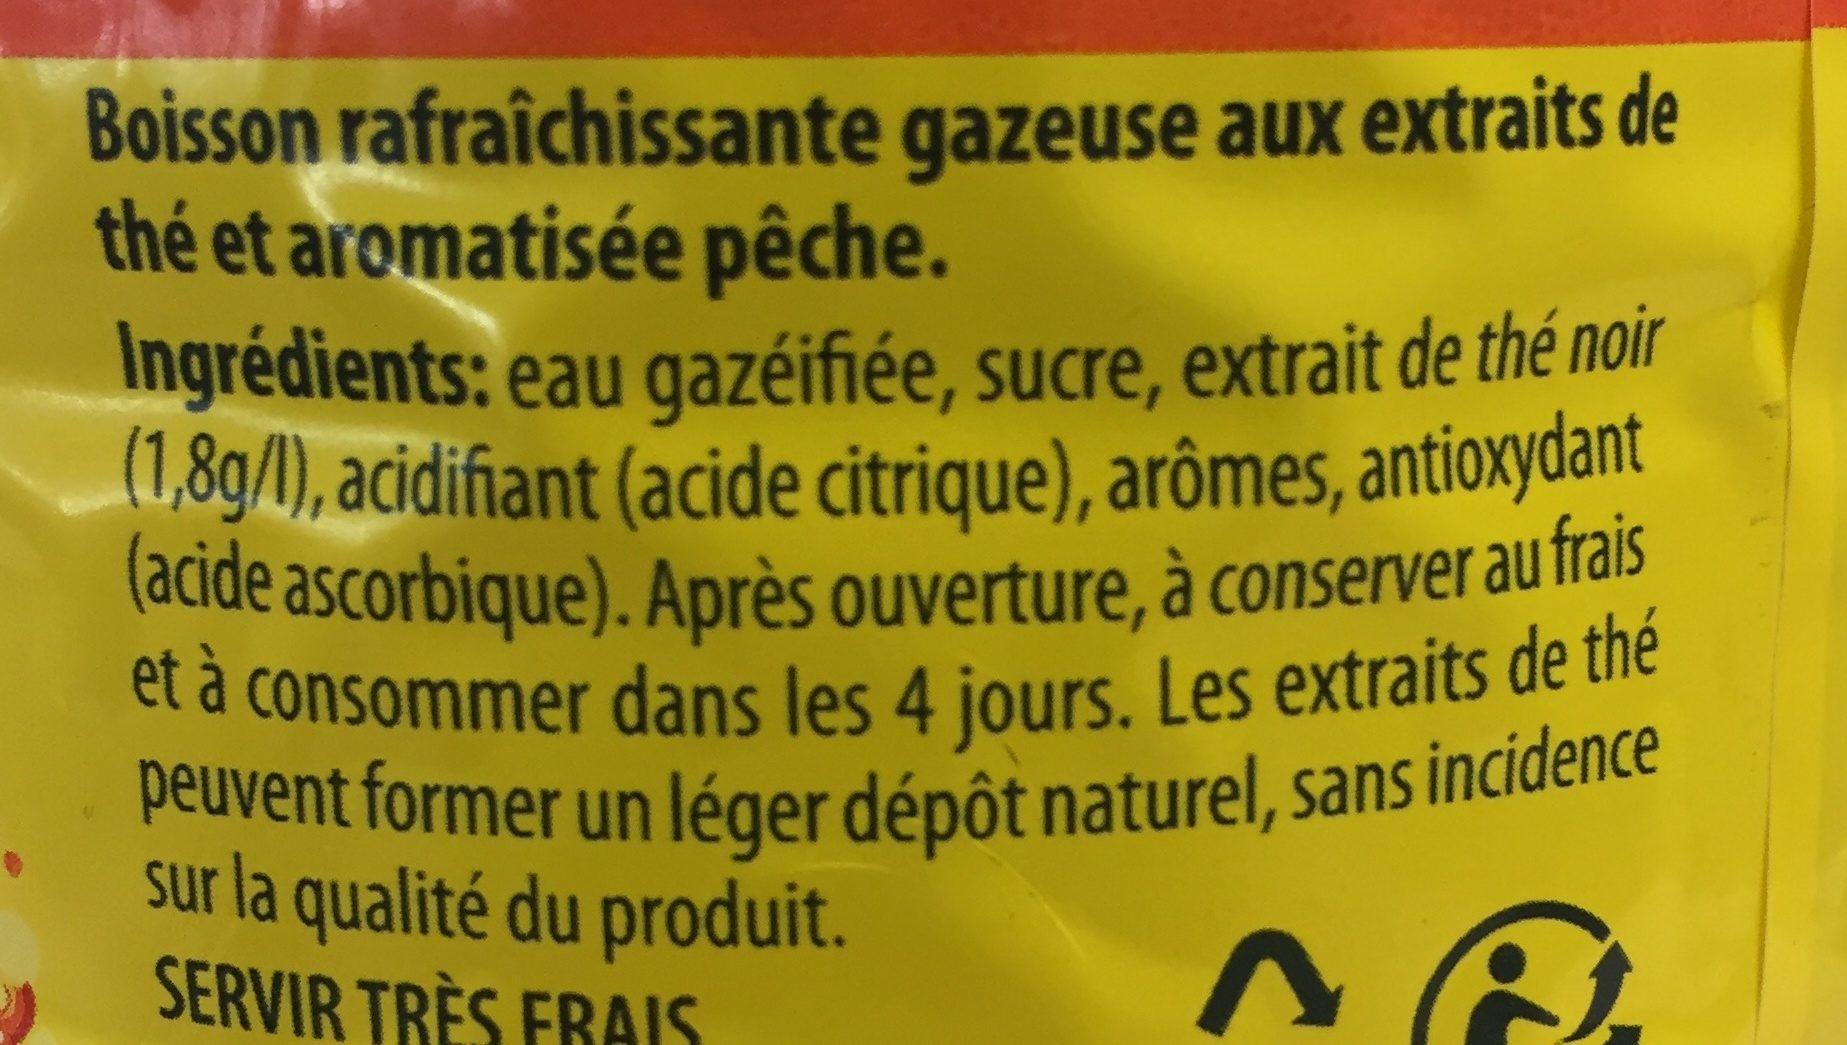 Lipton Liptonic pétillant saveur pêche 1,5 L - Ingrédients - fr